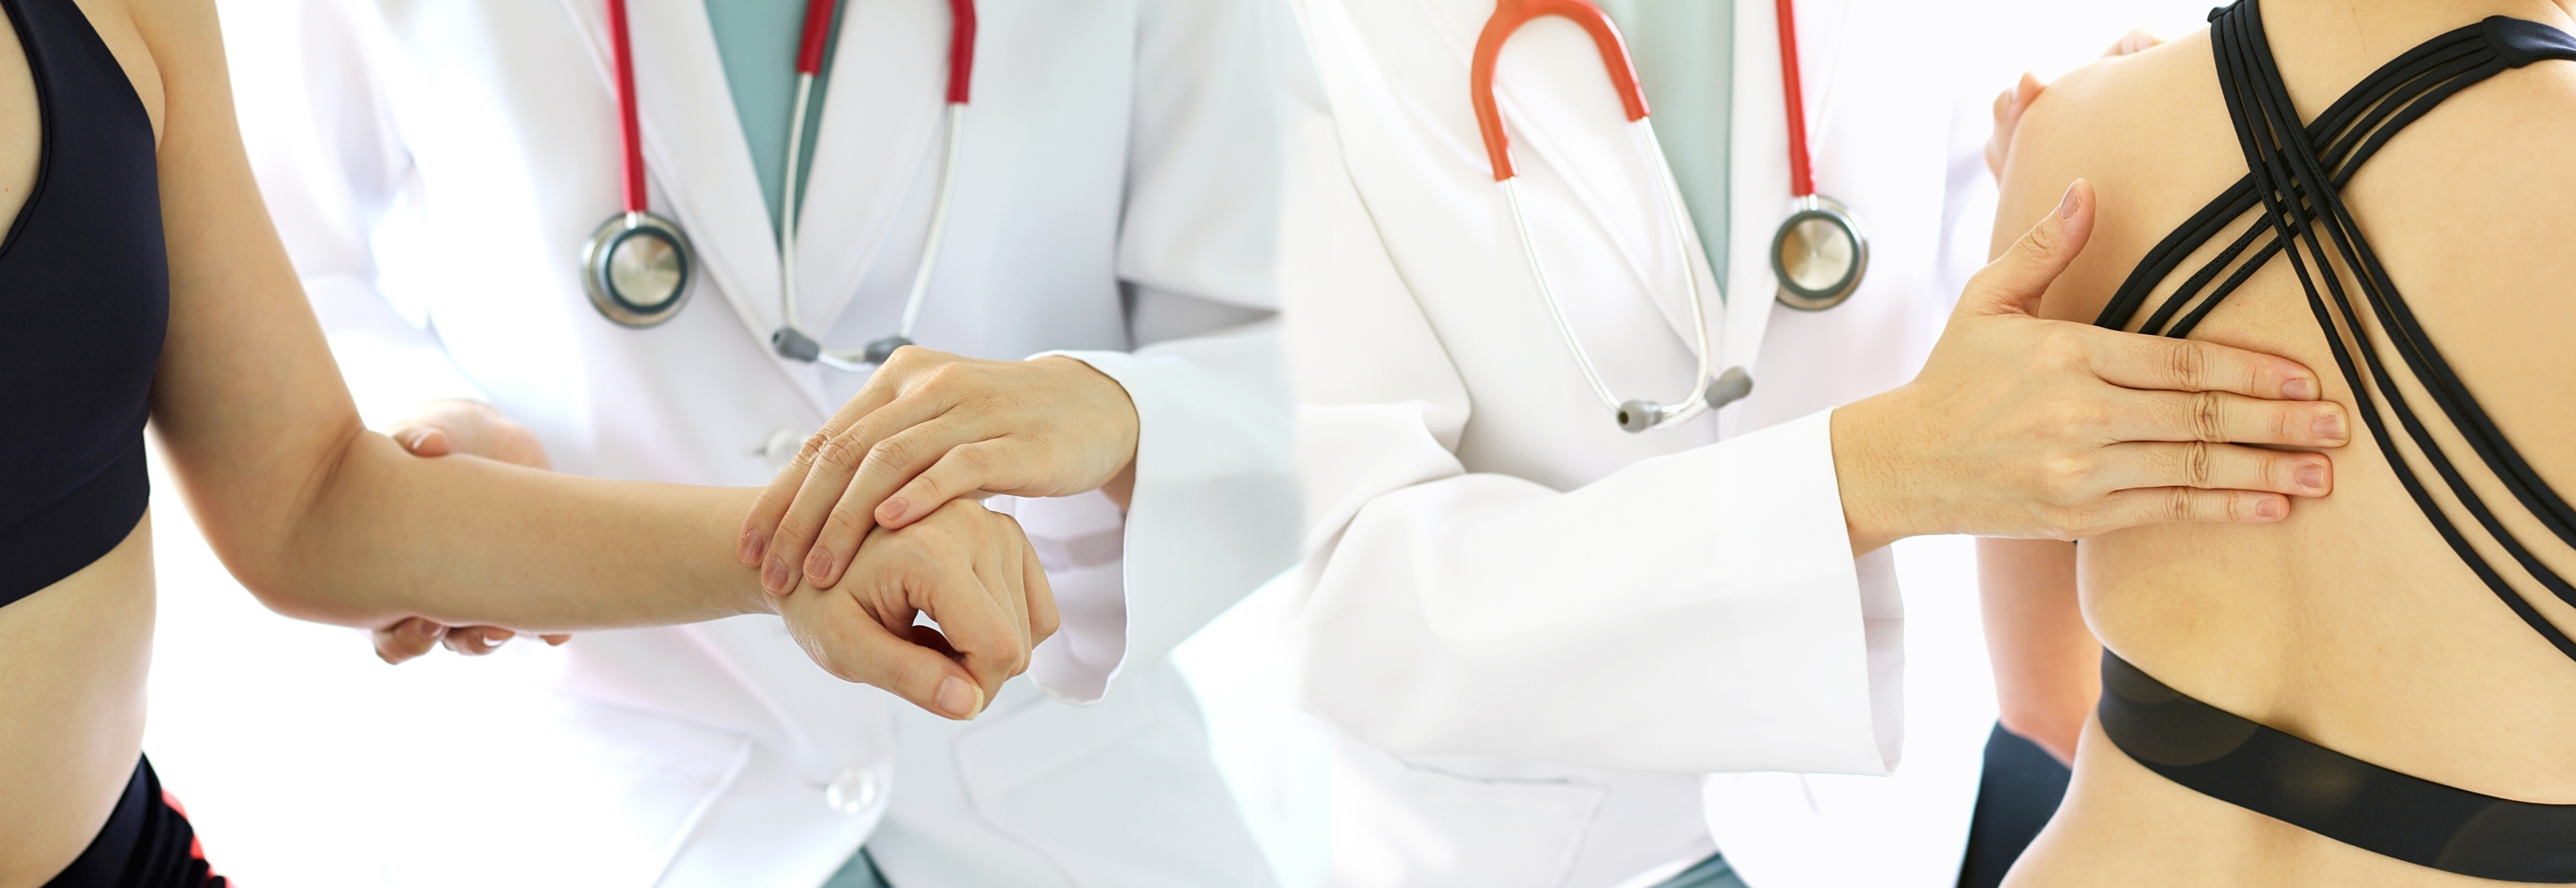 hippokrates ortopedia